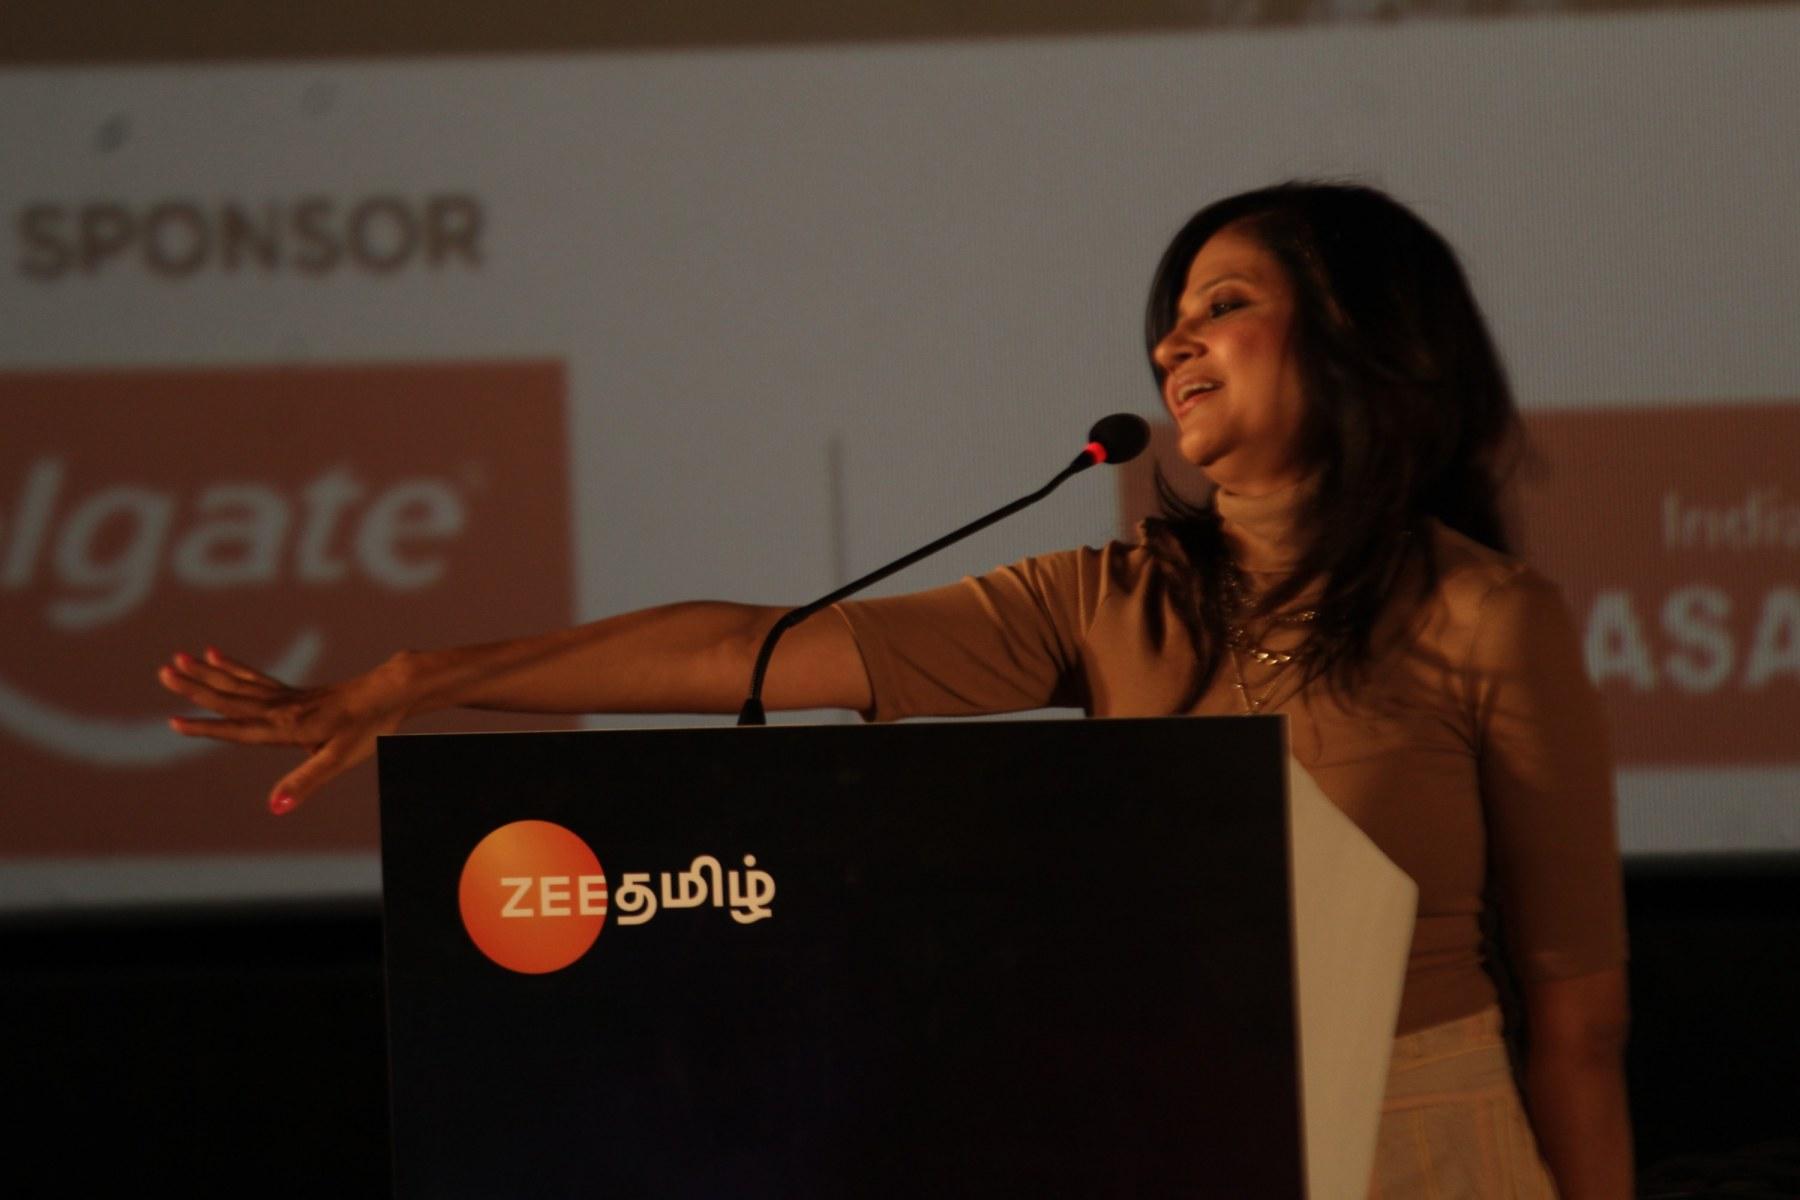 Rockstar-Music-reality-show-in-Zee-Tamil-6